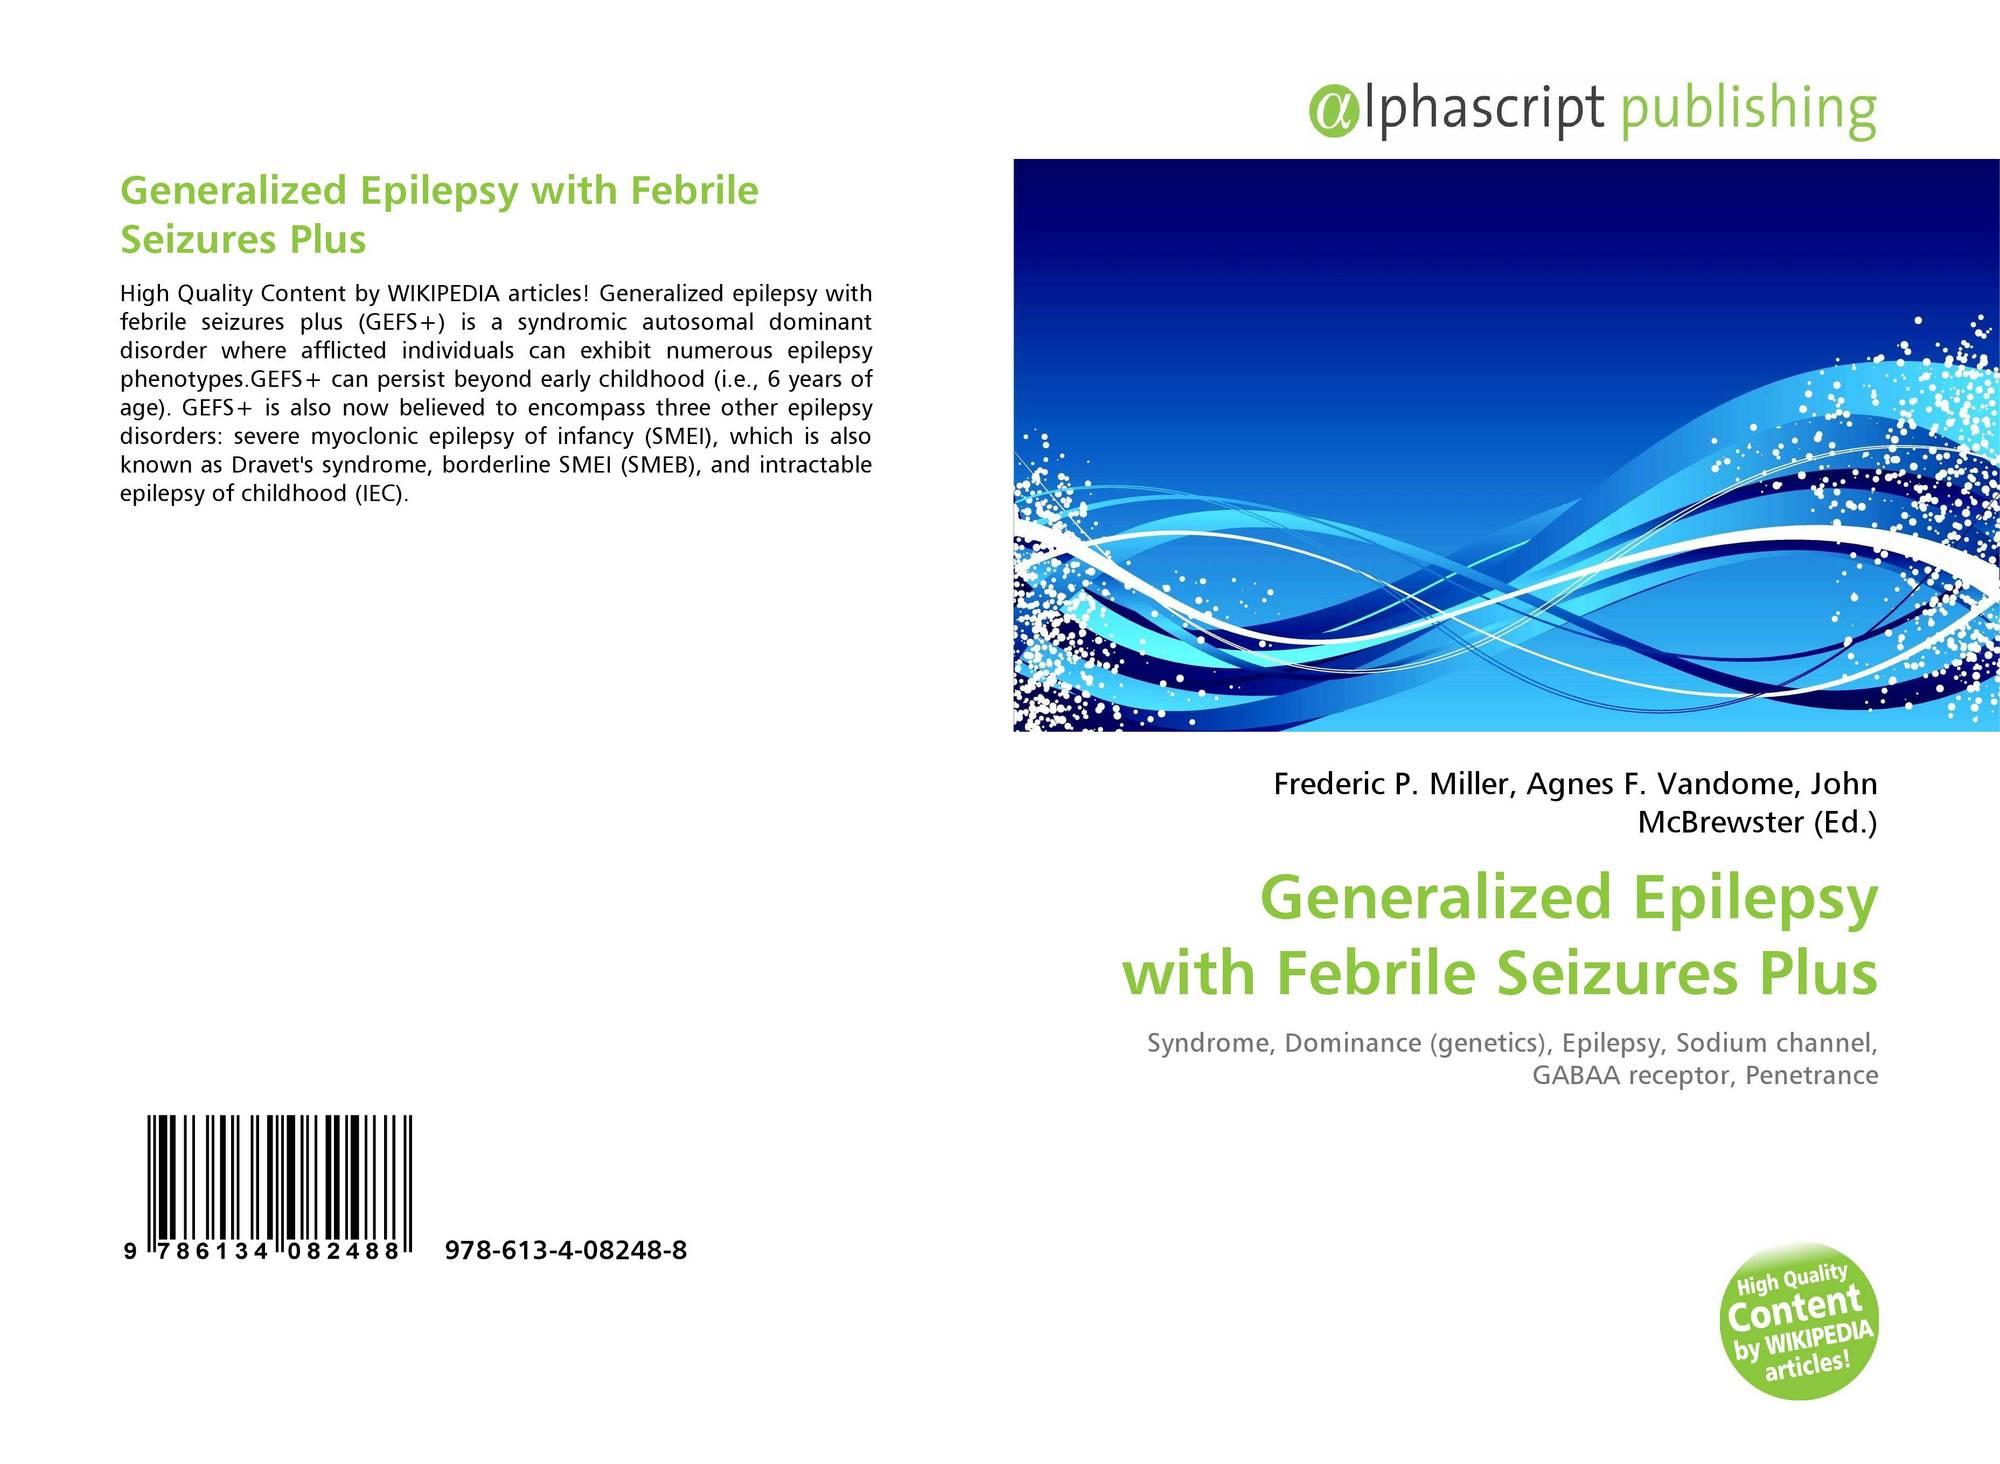 Generalized Epilepsy with Febrile Seizures Plus, 978-613-4